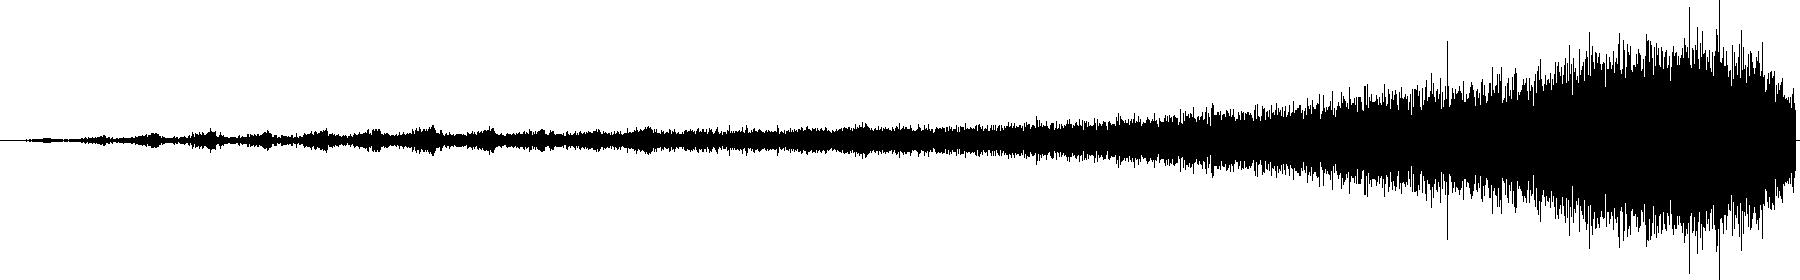 looperman l 0000003 0000088 serialchiller chilla reverse cymbal fx